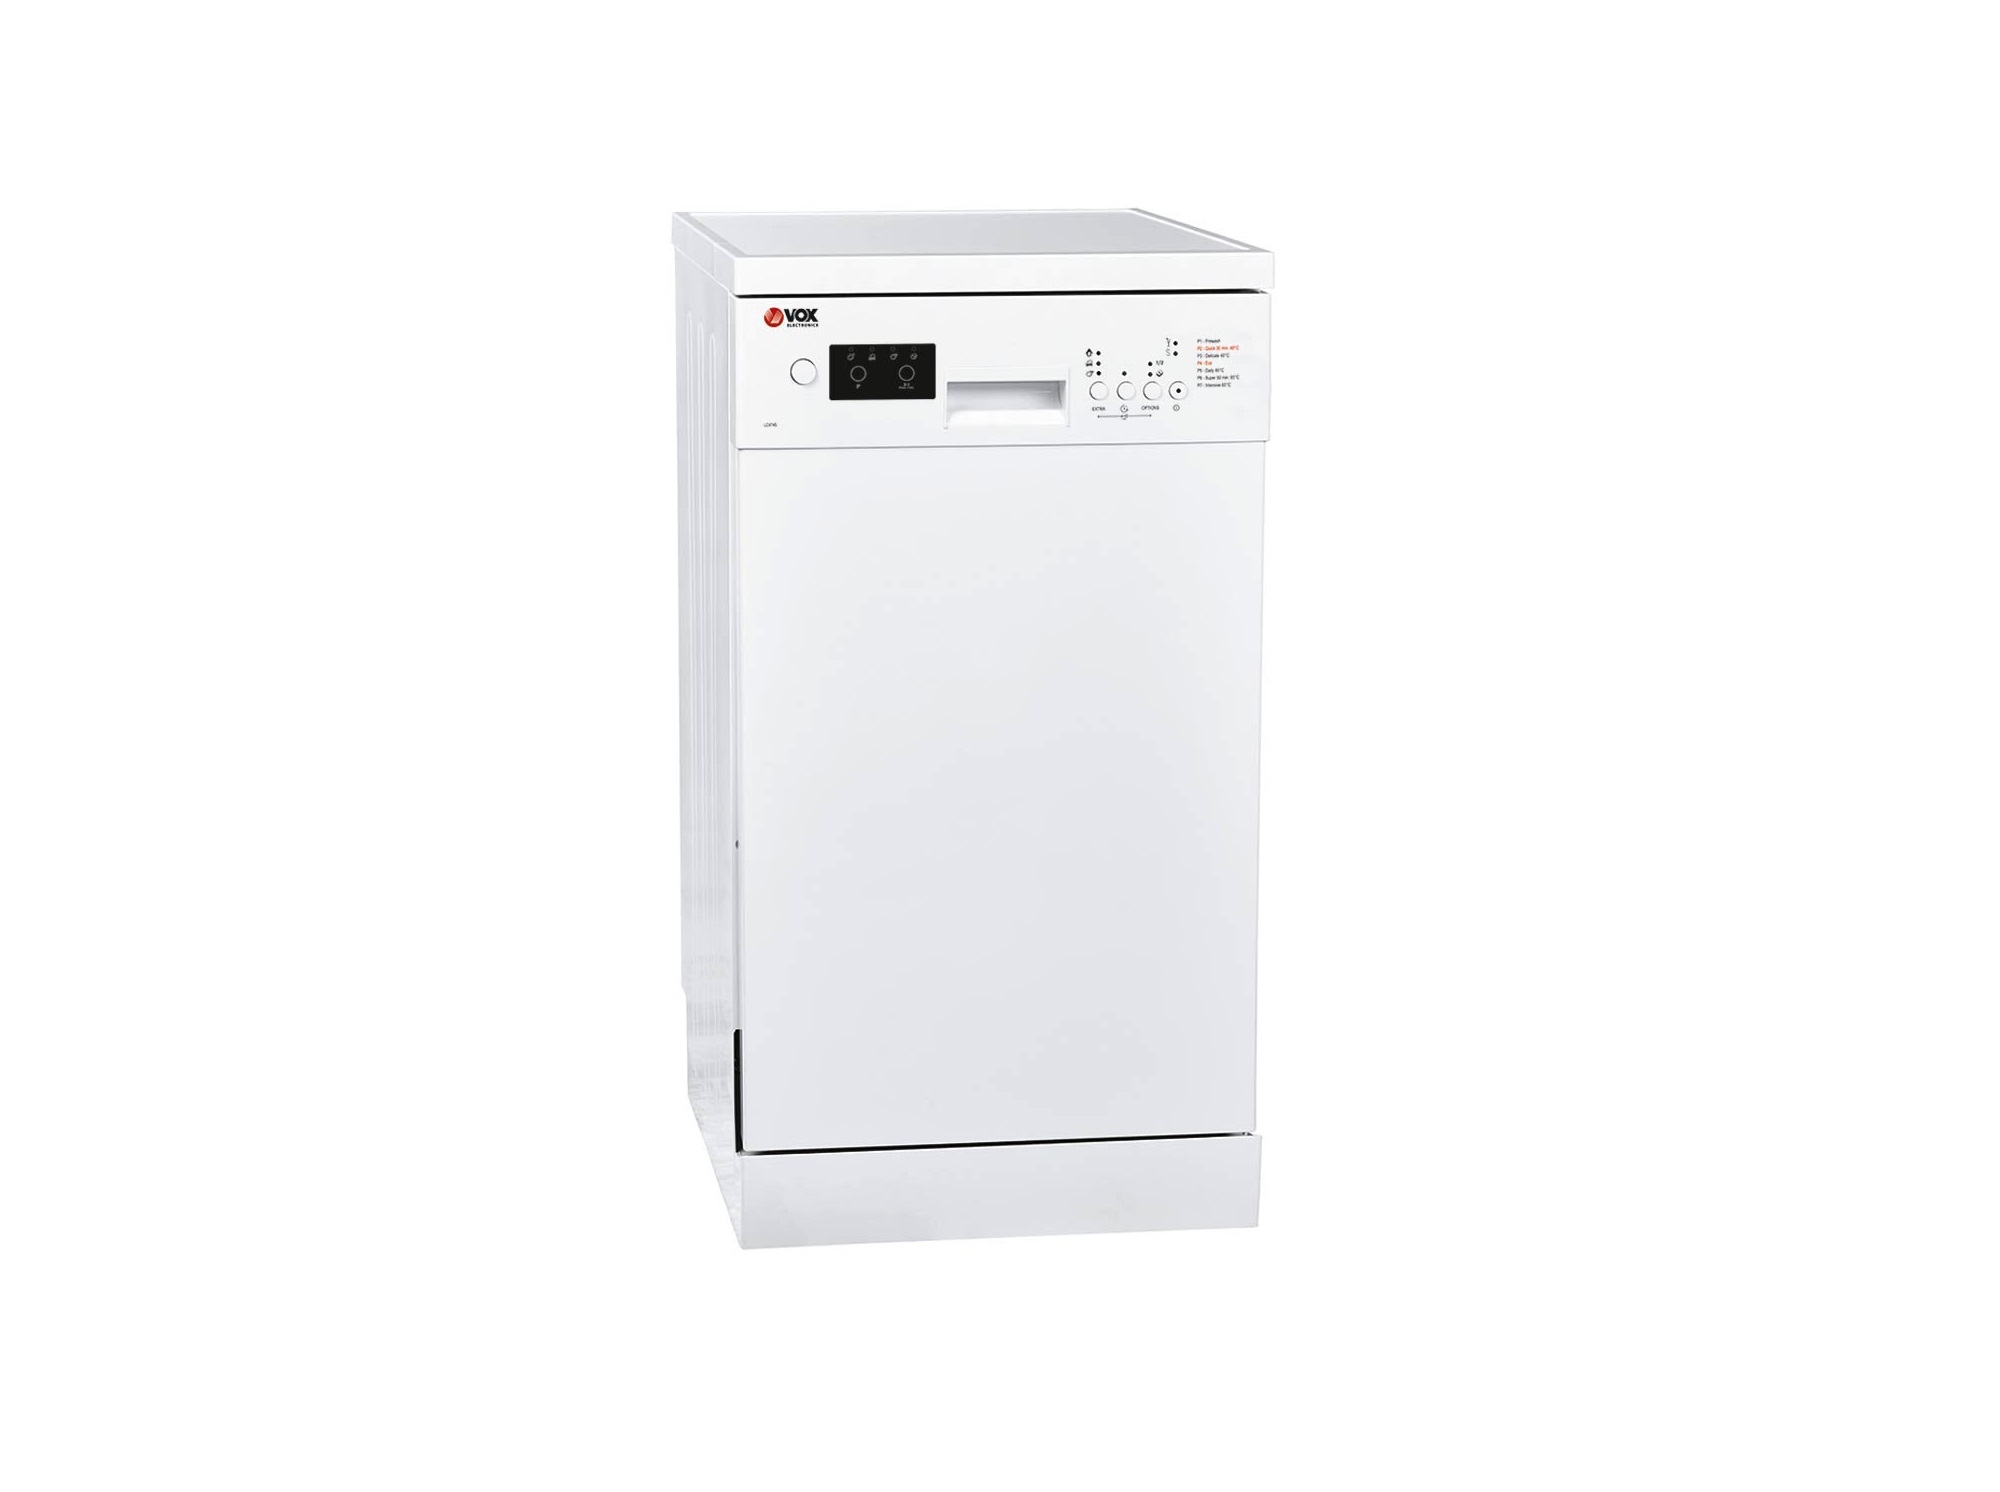 VOX masina za pranje sudja LC 4745